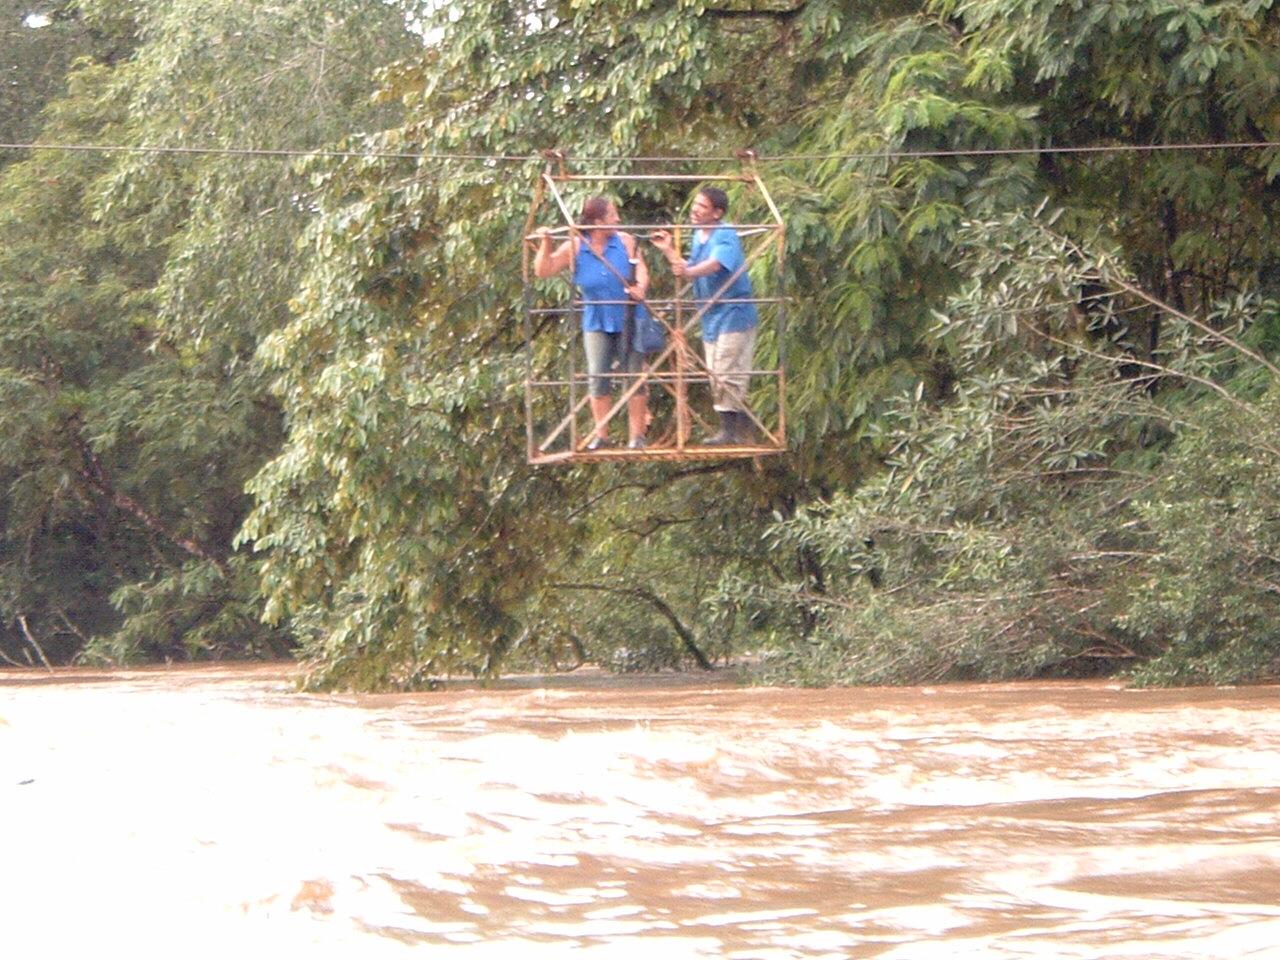 costaricapics 031.jpg